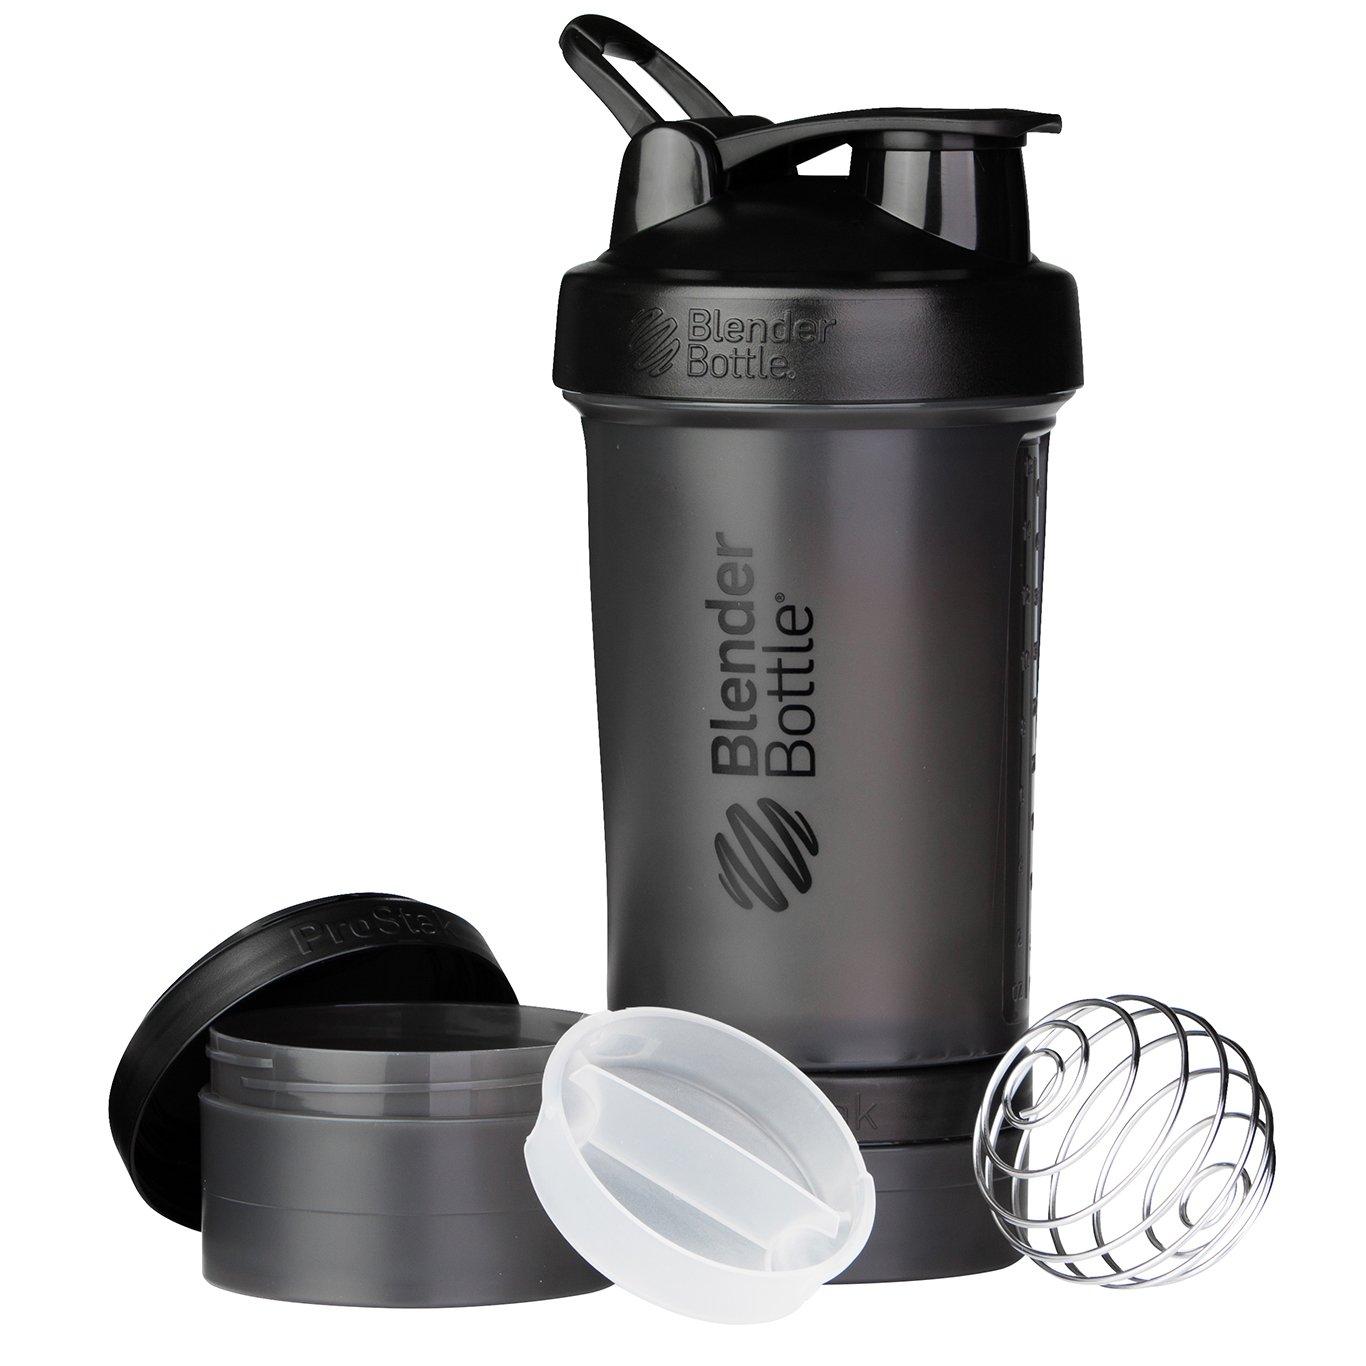 BlenderBottle ProStak System with 22-Ounce Bottle and Twist n' Lock Storage, All Black by Blender Bottle (Image #1)